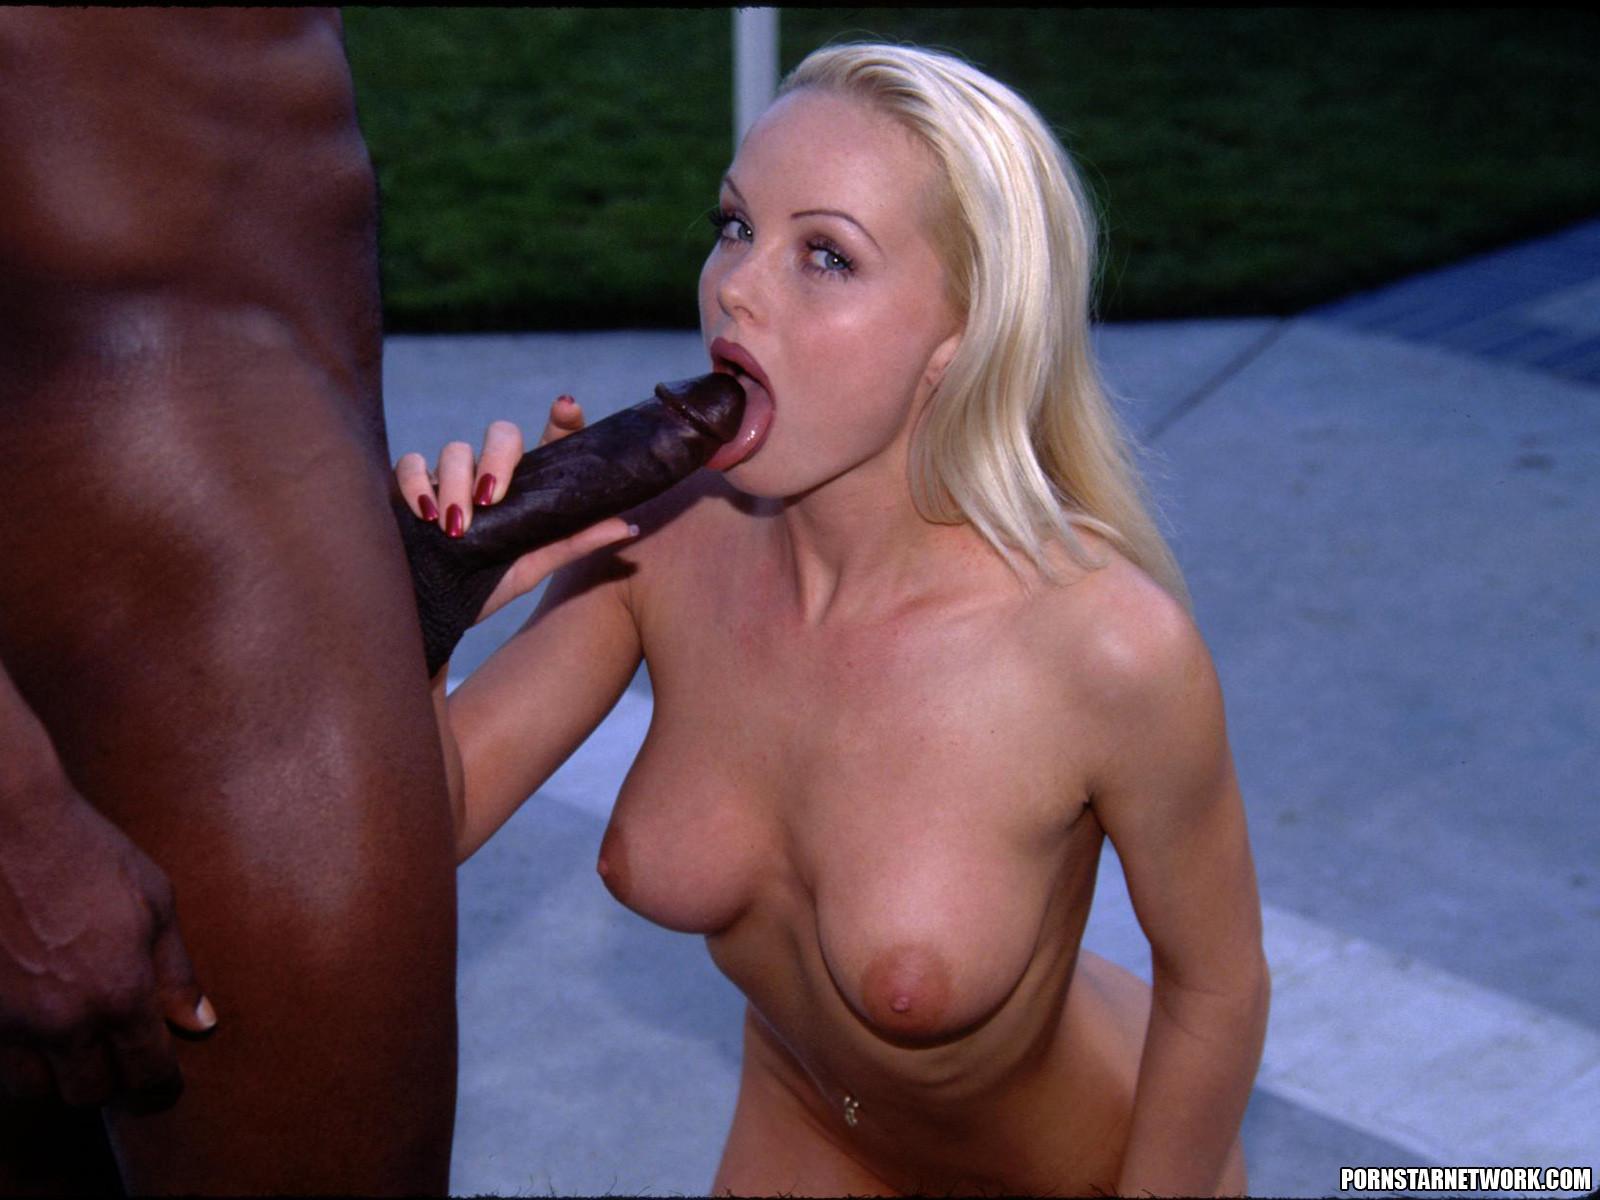 silvia-saint-blowjob-movie-sl-hot-naked-girls